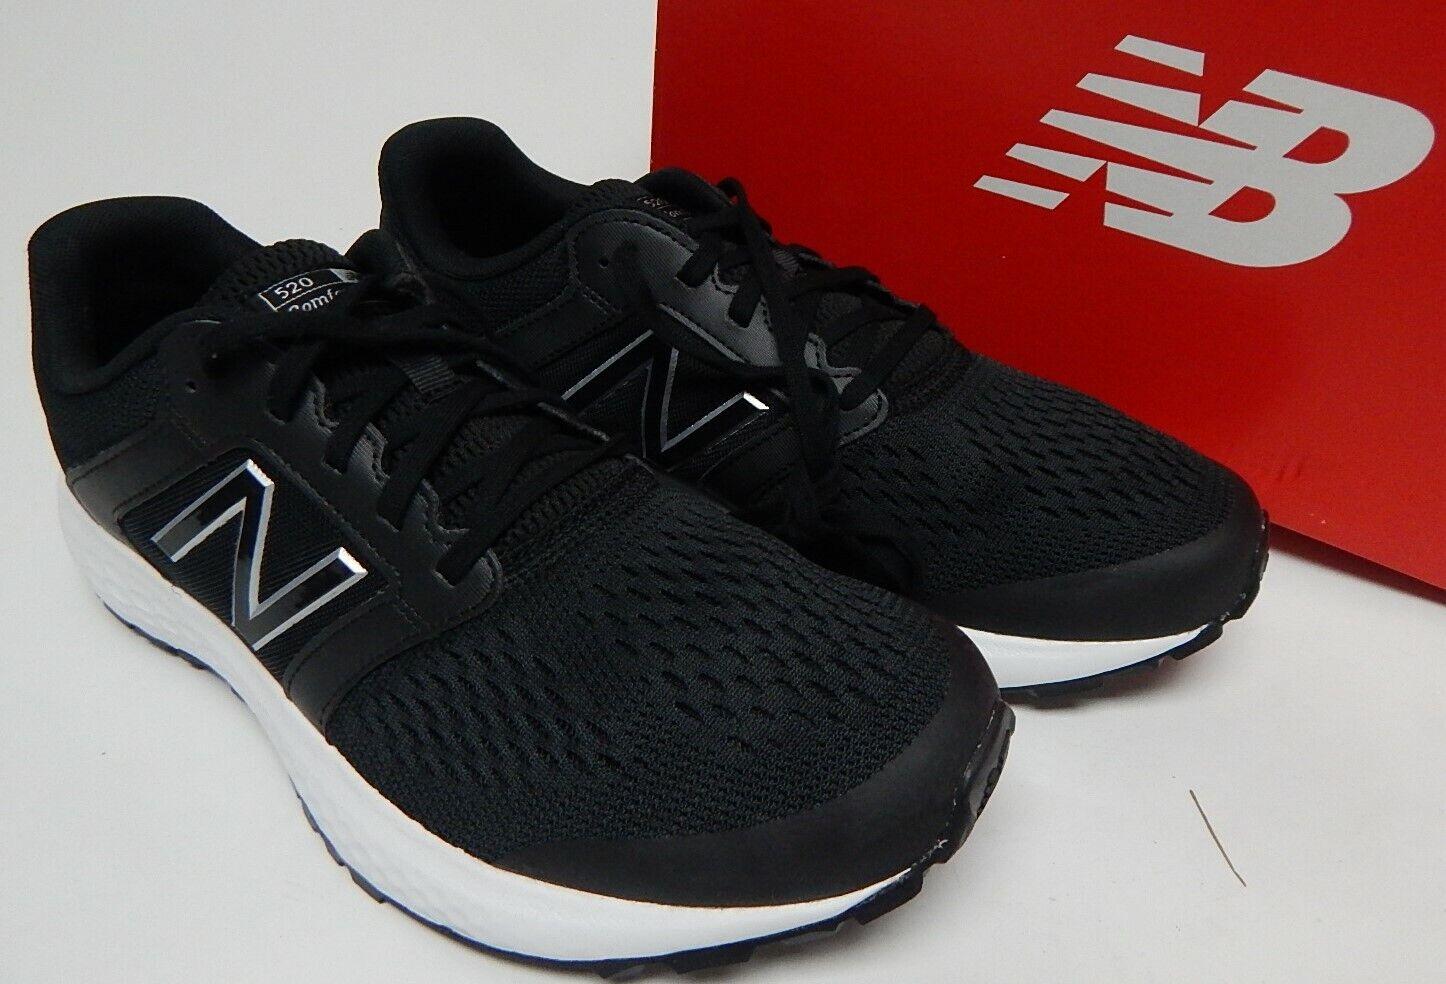 New Balance 520 V5 ComfortRide Size 10 M (D) EU 44 Men's Mesh Running Shoe Black